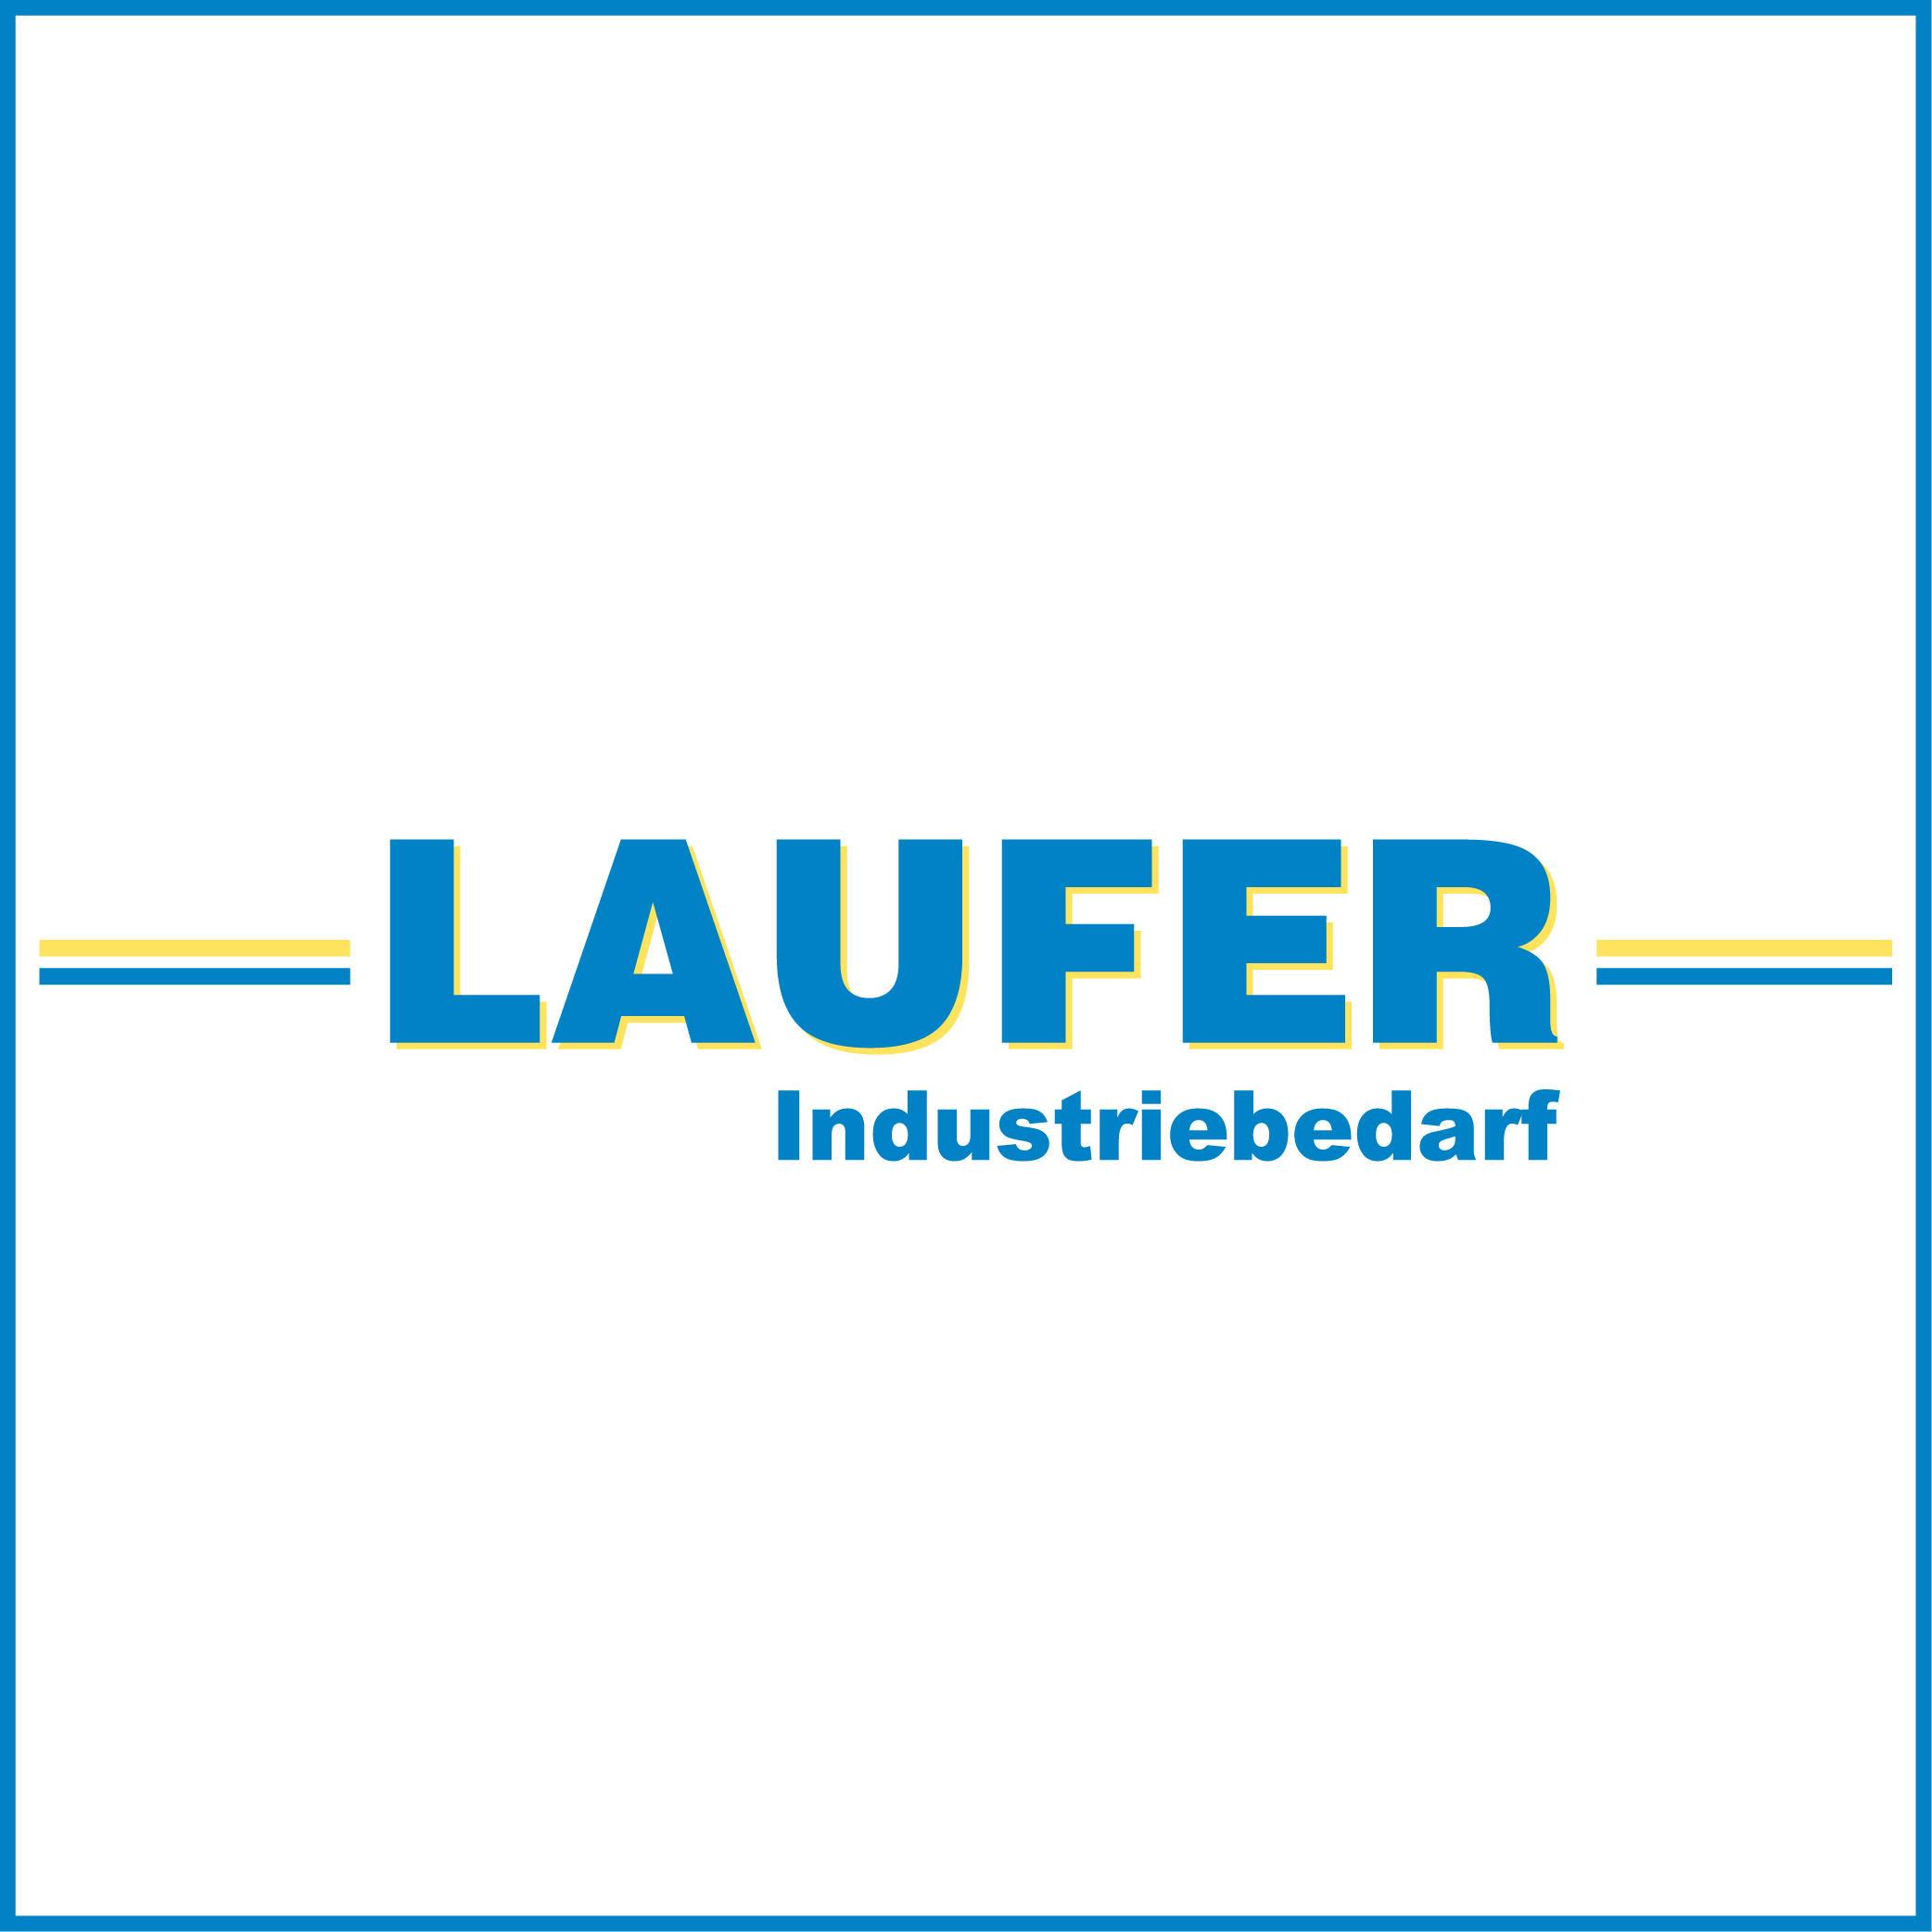 Bild zu Paul Laufer GmbH & Co. KG in Gießen